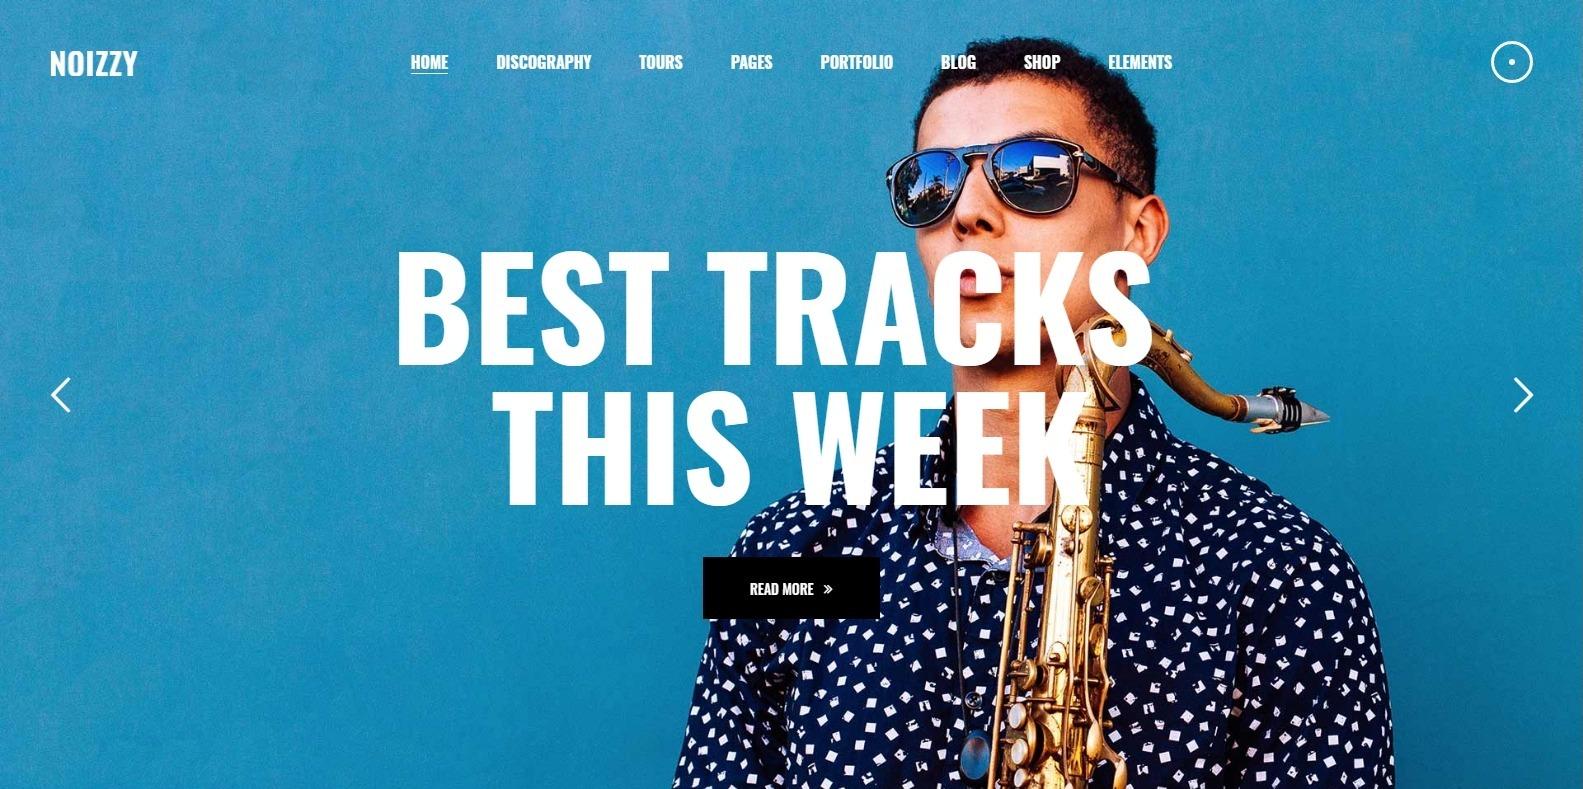 noizzy-html-music-website-template